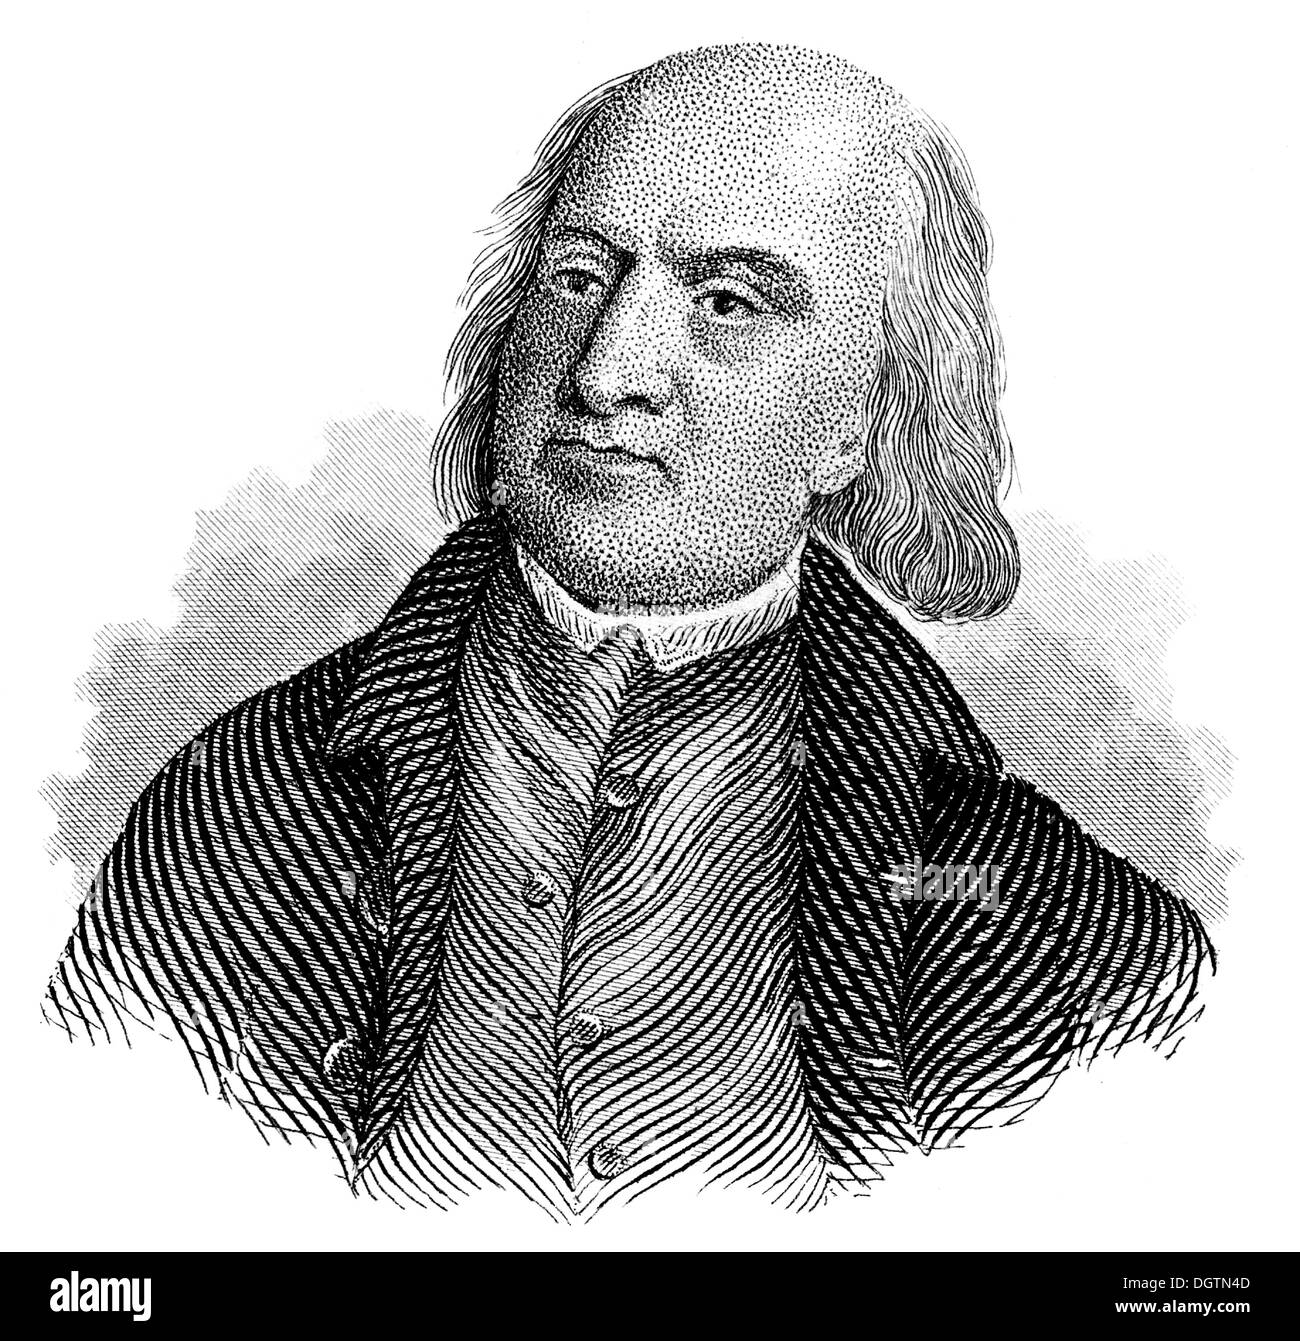 Jeremy Bentham, 1748 - 1832, a British philosopher, jurist, and social reformer, - Stock Image